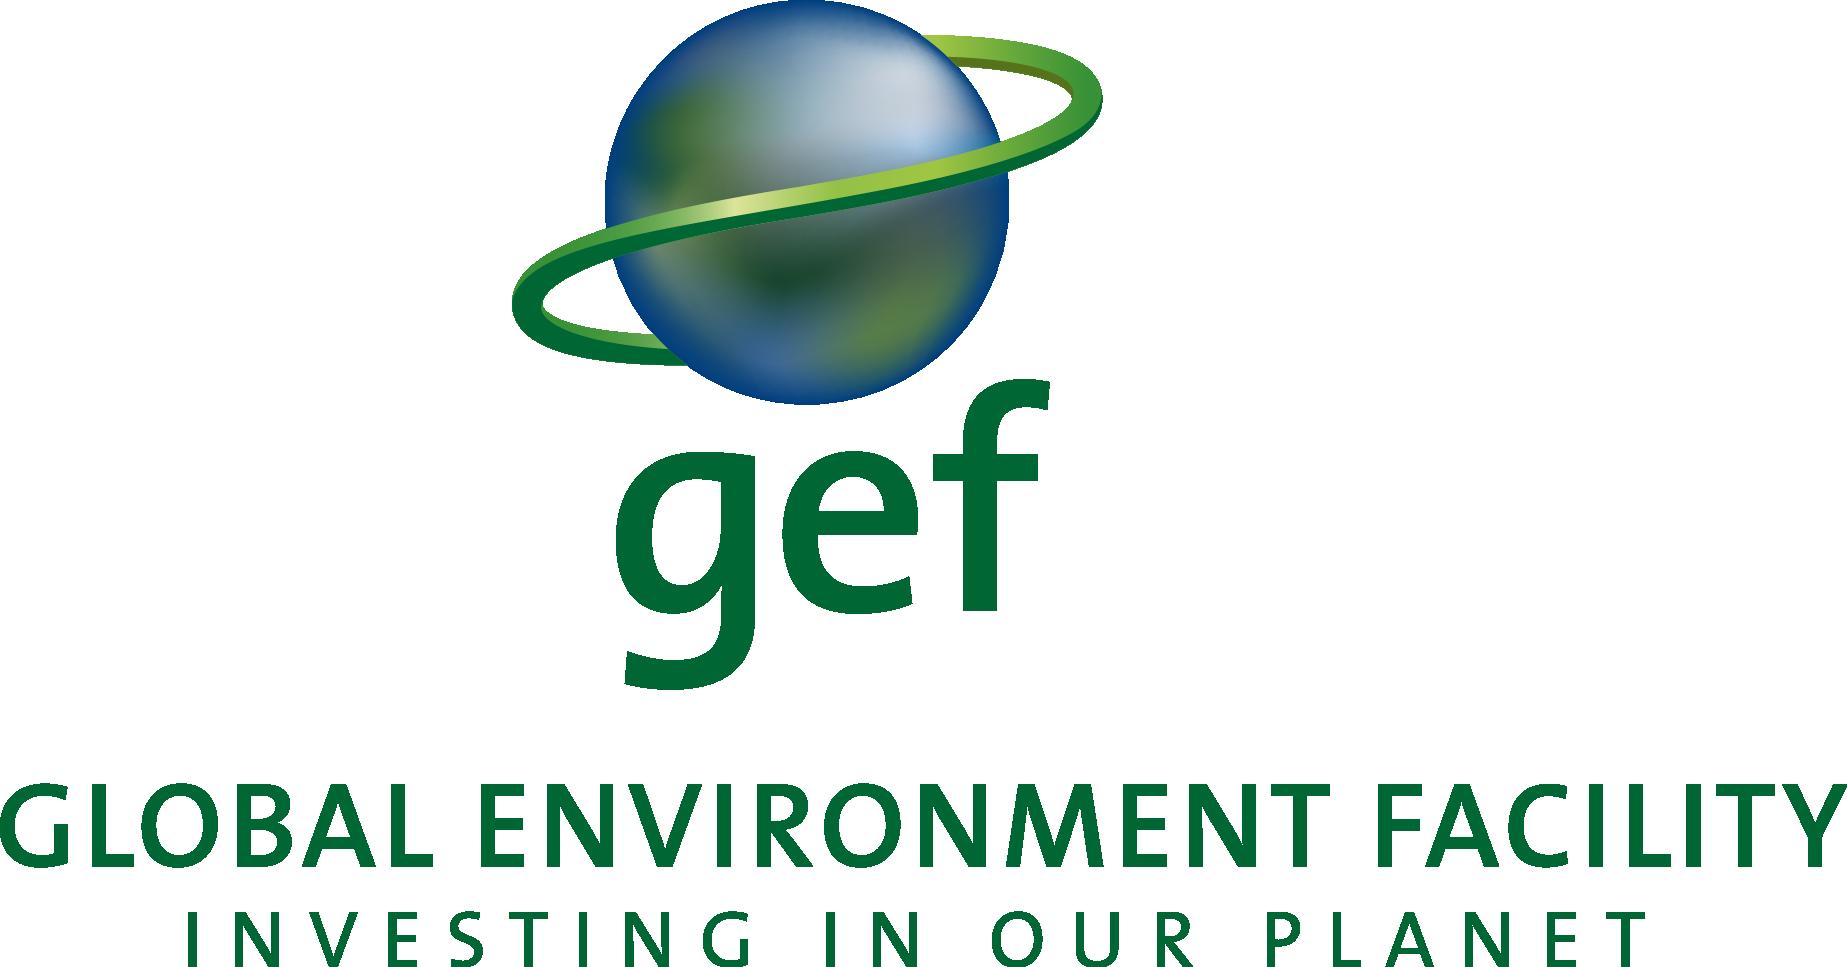 gef-global-environment-facility-logo